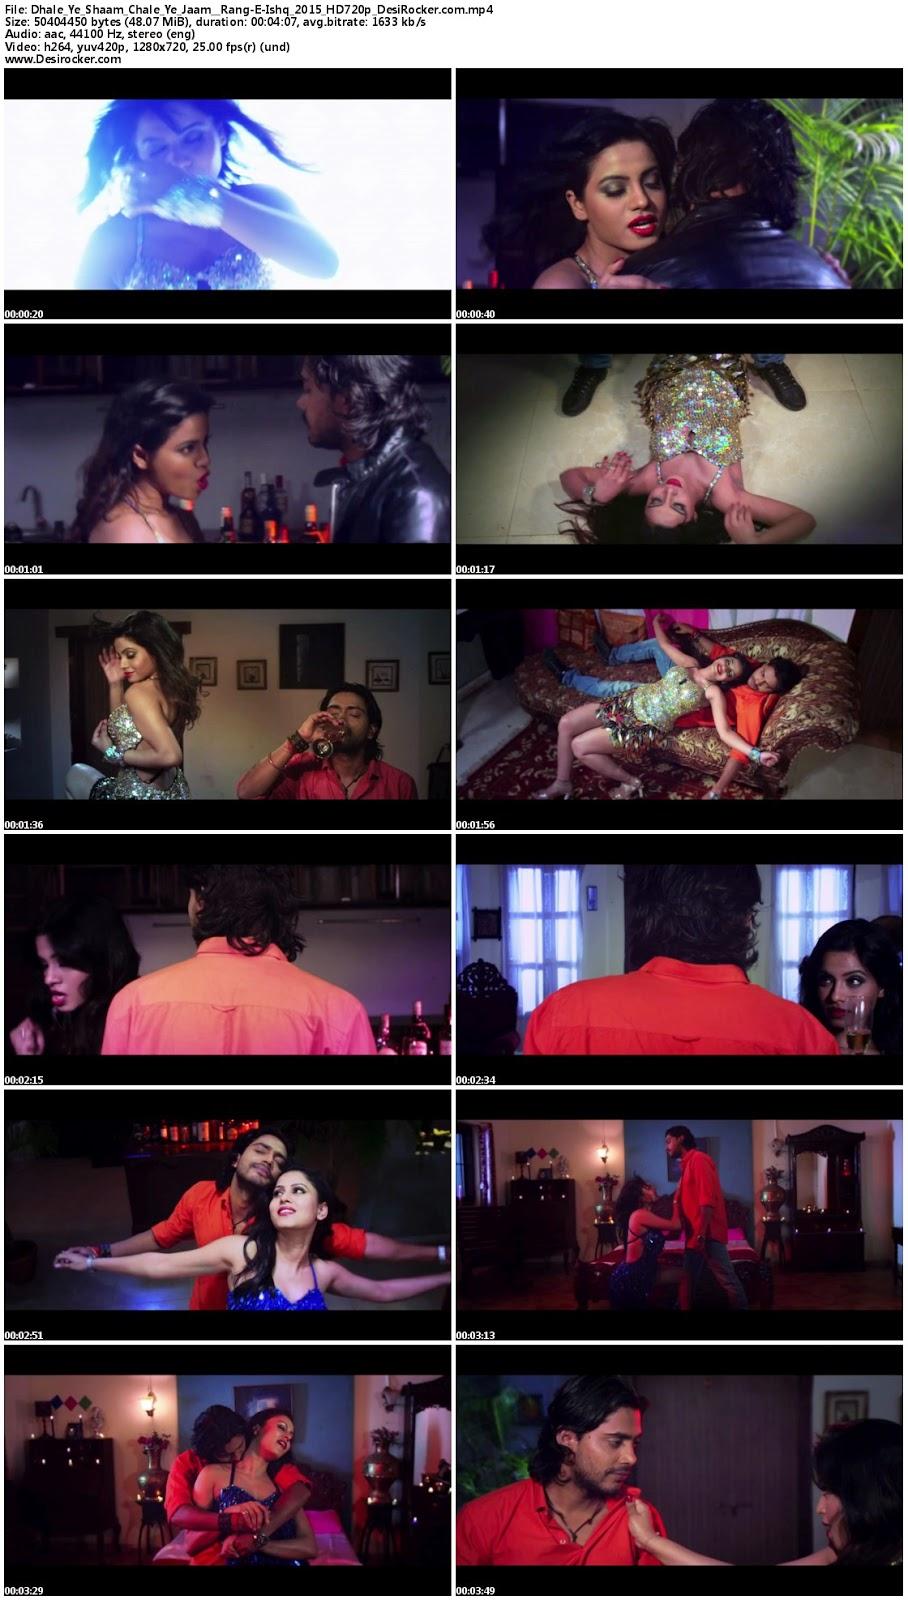 Download Dhale Ye Shaam Chale Ye Jaam – Rang-E-Ishq (2015) HD 720p Full Video Song